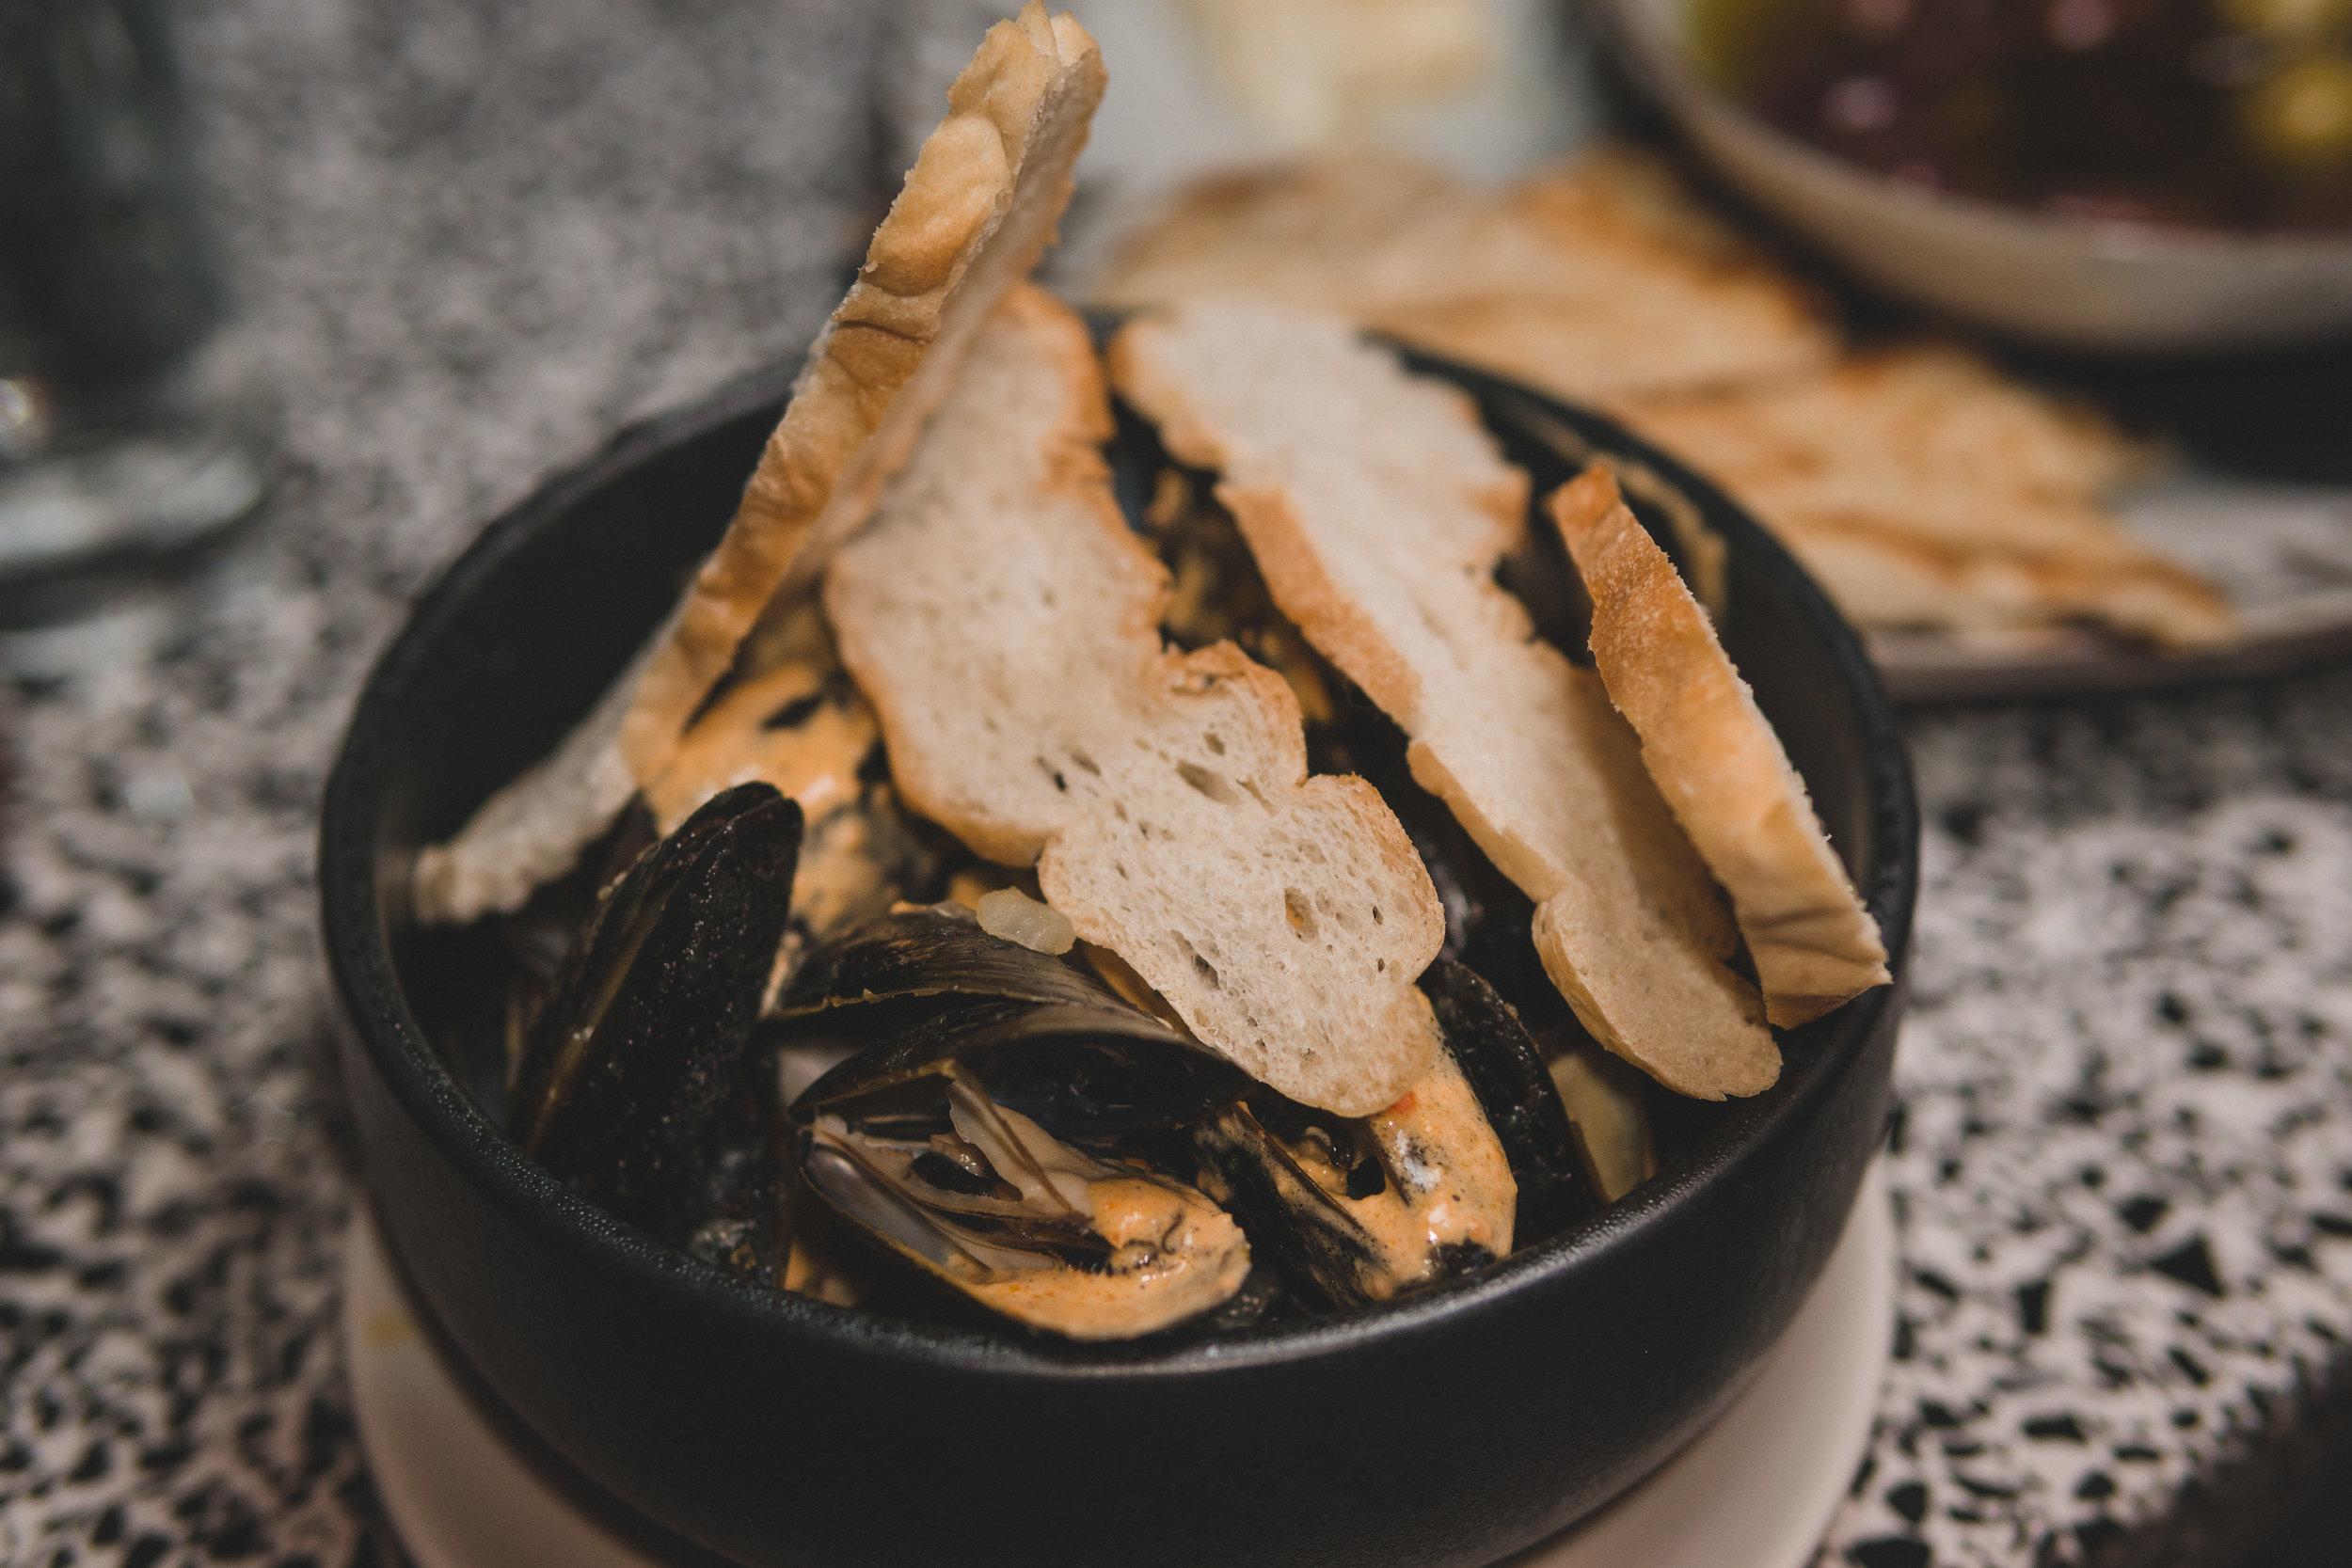 Mussels Billi Bi: Saffron potato, smoked andouille sausage, rouille & toasted baguette